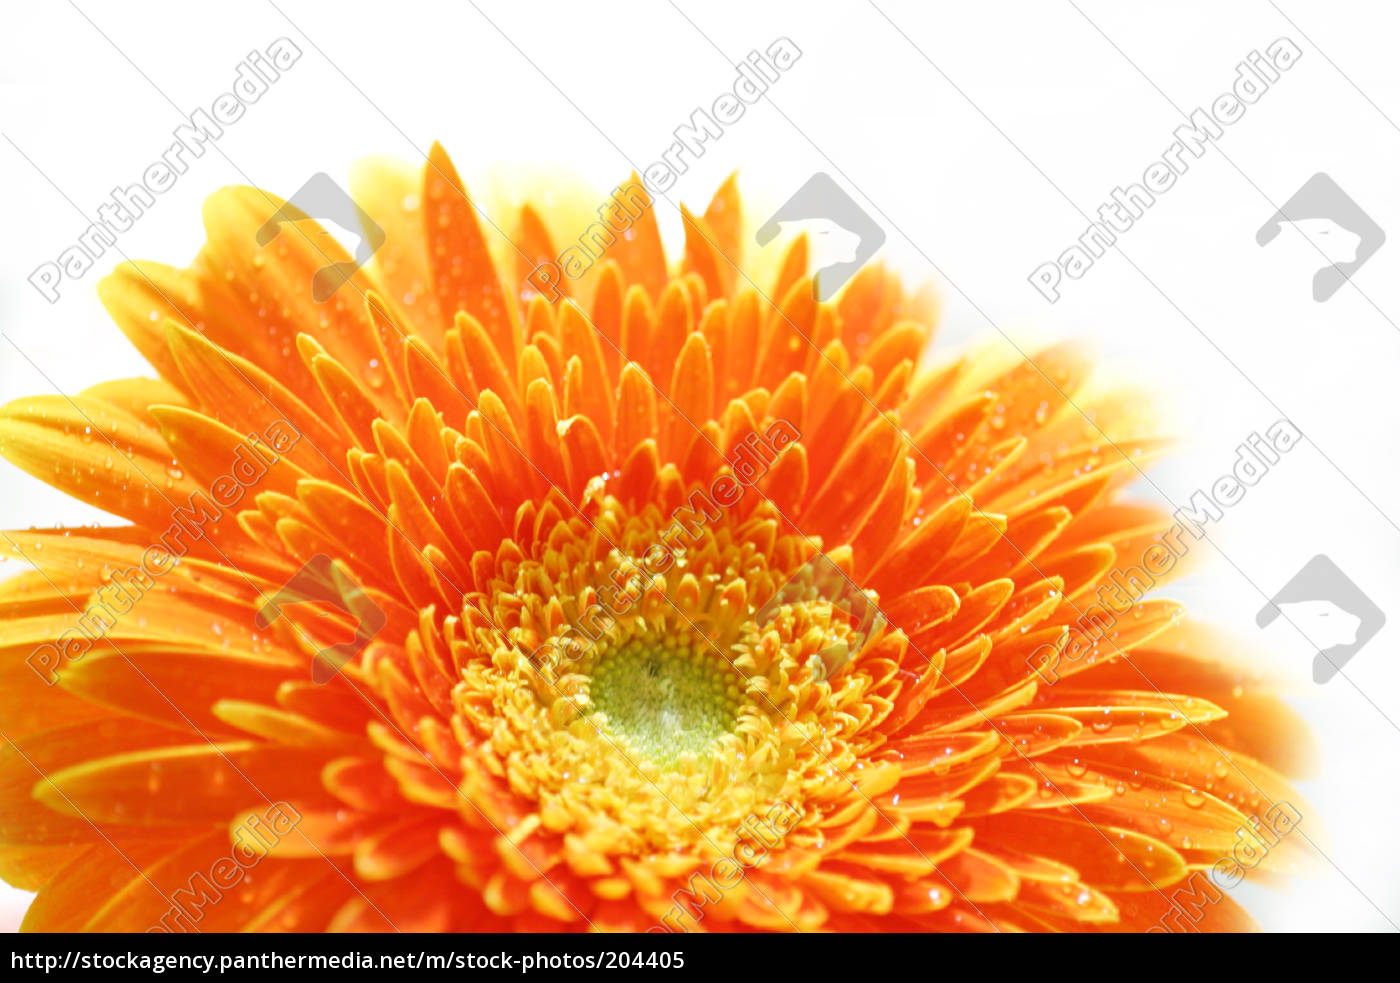 gerbera, flower - 204405